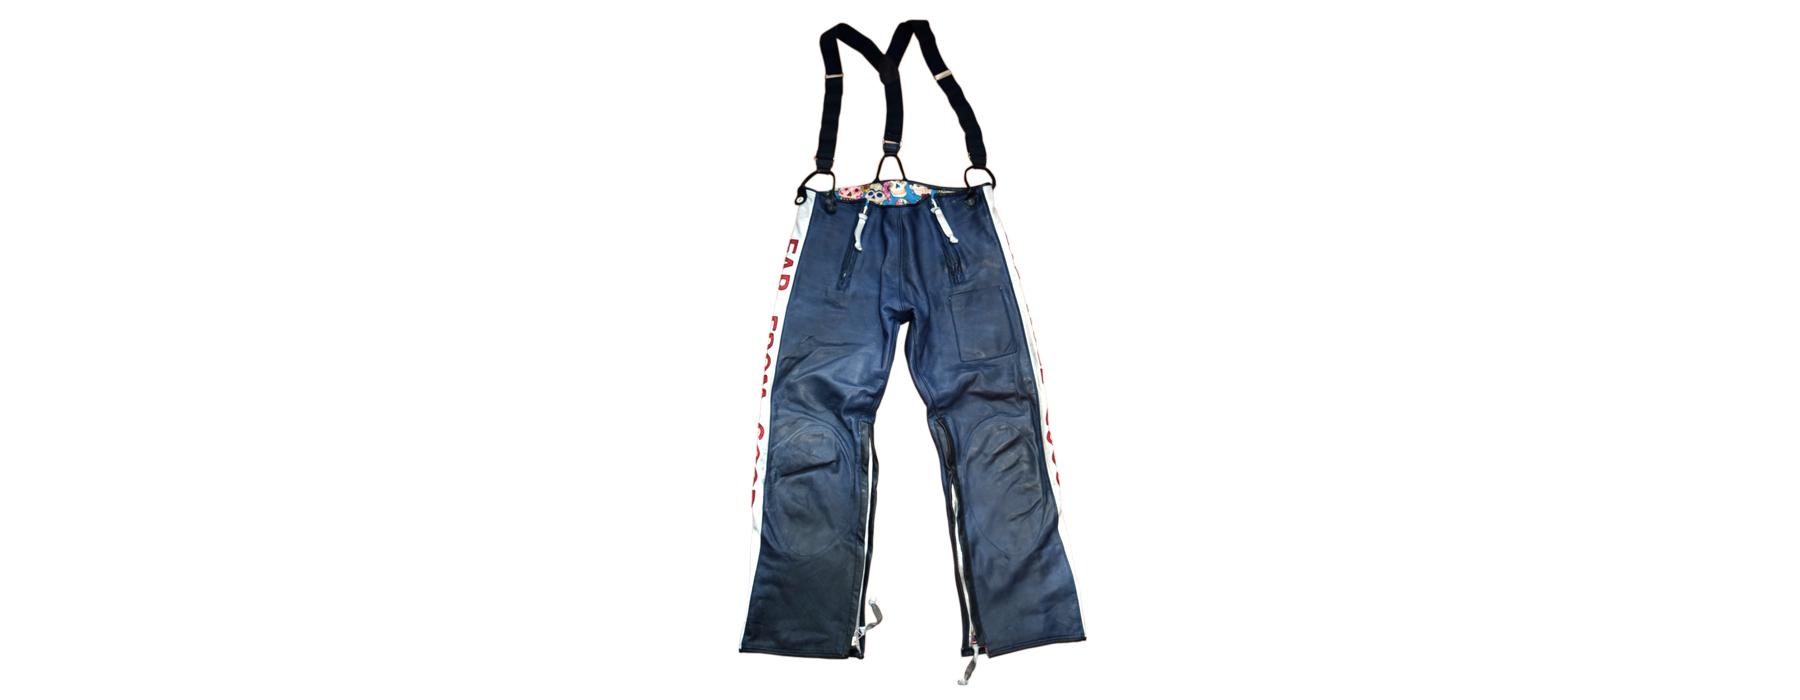 de curae | Candyman Racing Suit, pants front – Thorsten Schlesinger